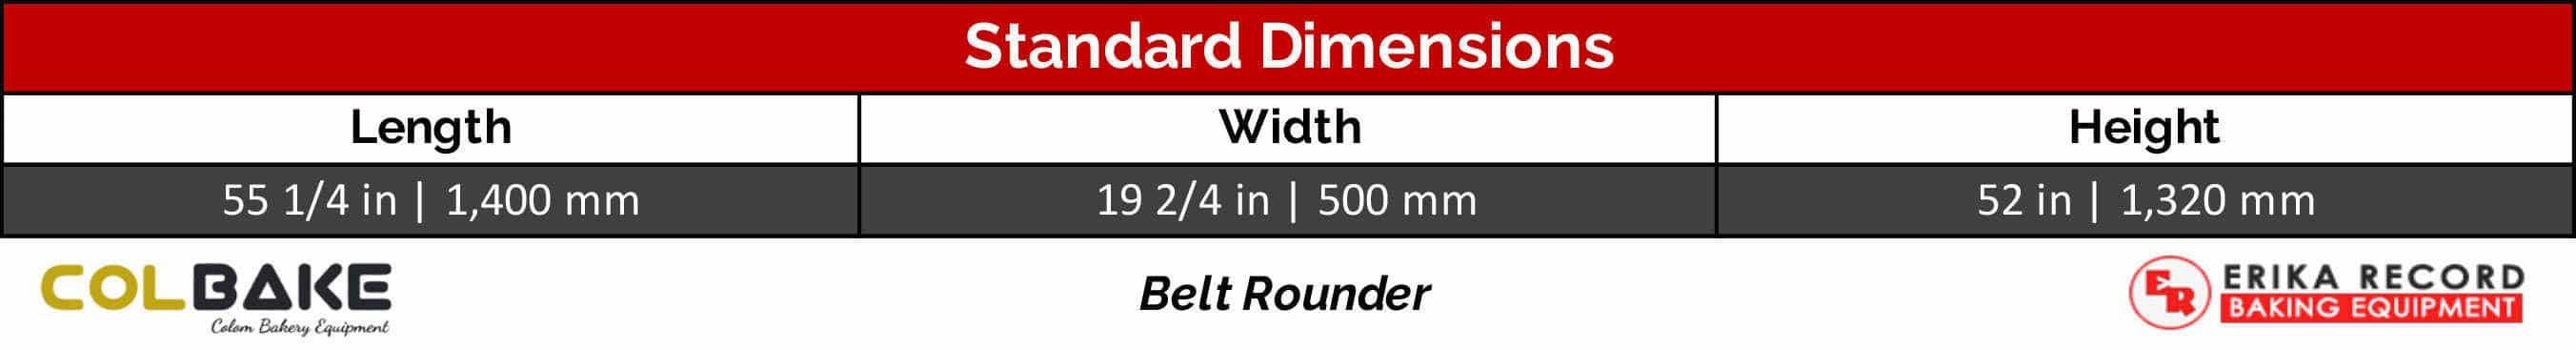 Colbake Belt Rounder Standard Dimensions